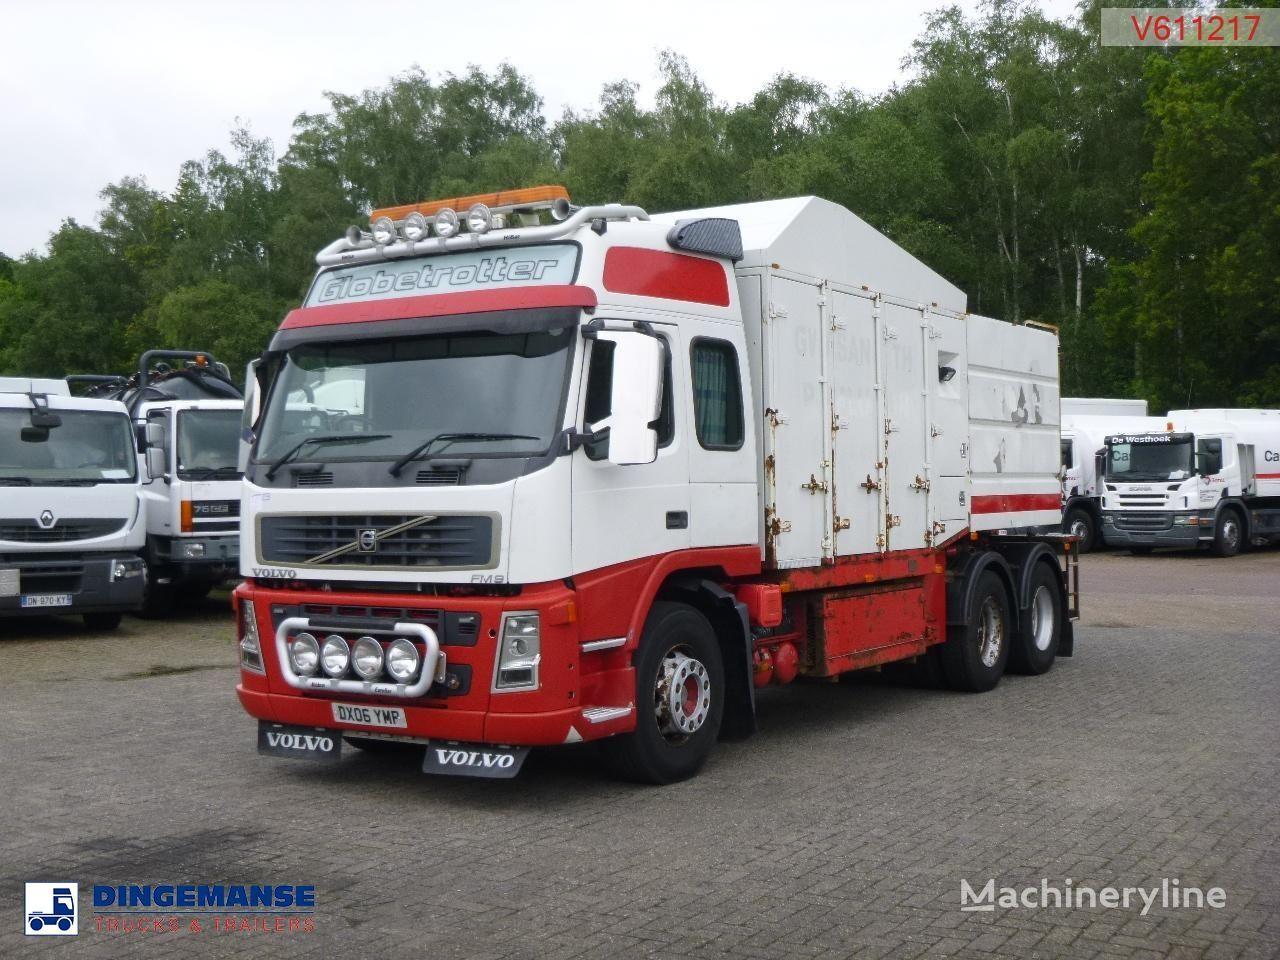 camion de vidange VOLVO FM 9 6X4 RHD Eurovac 1200 vacuum tank (tipping)